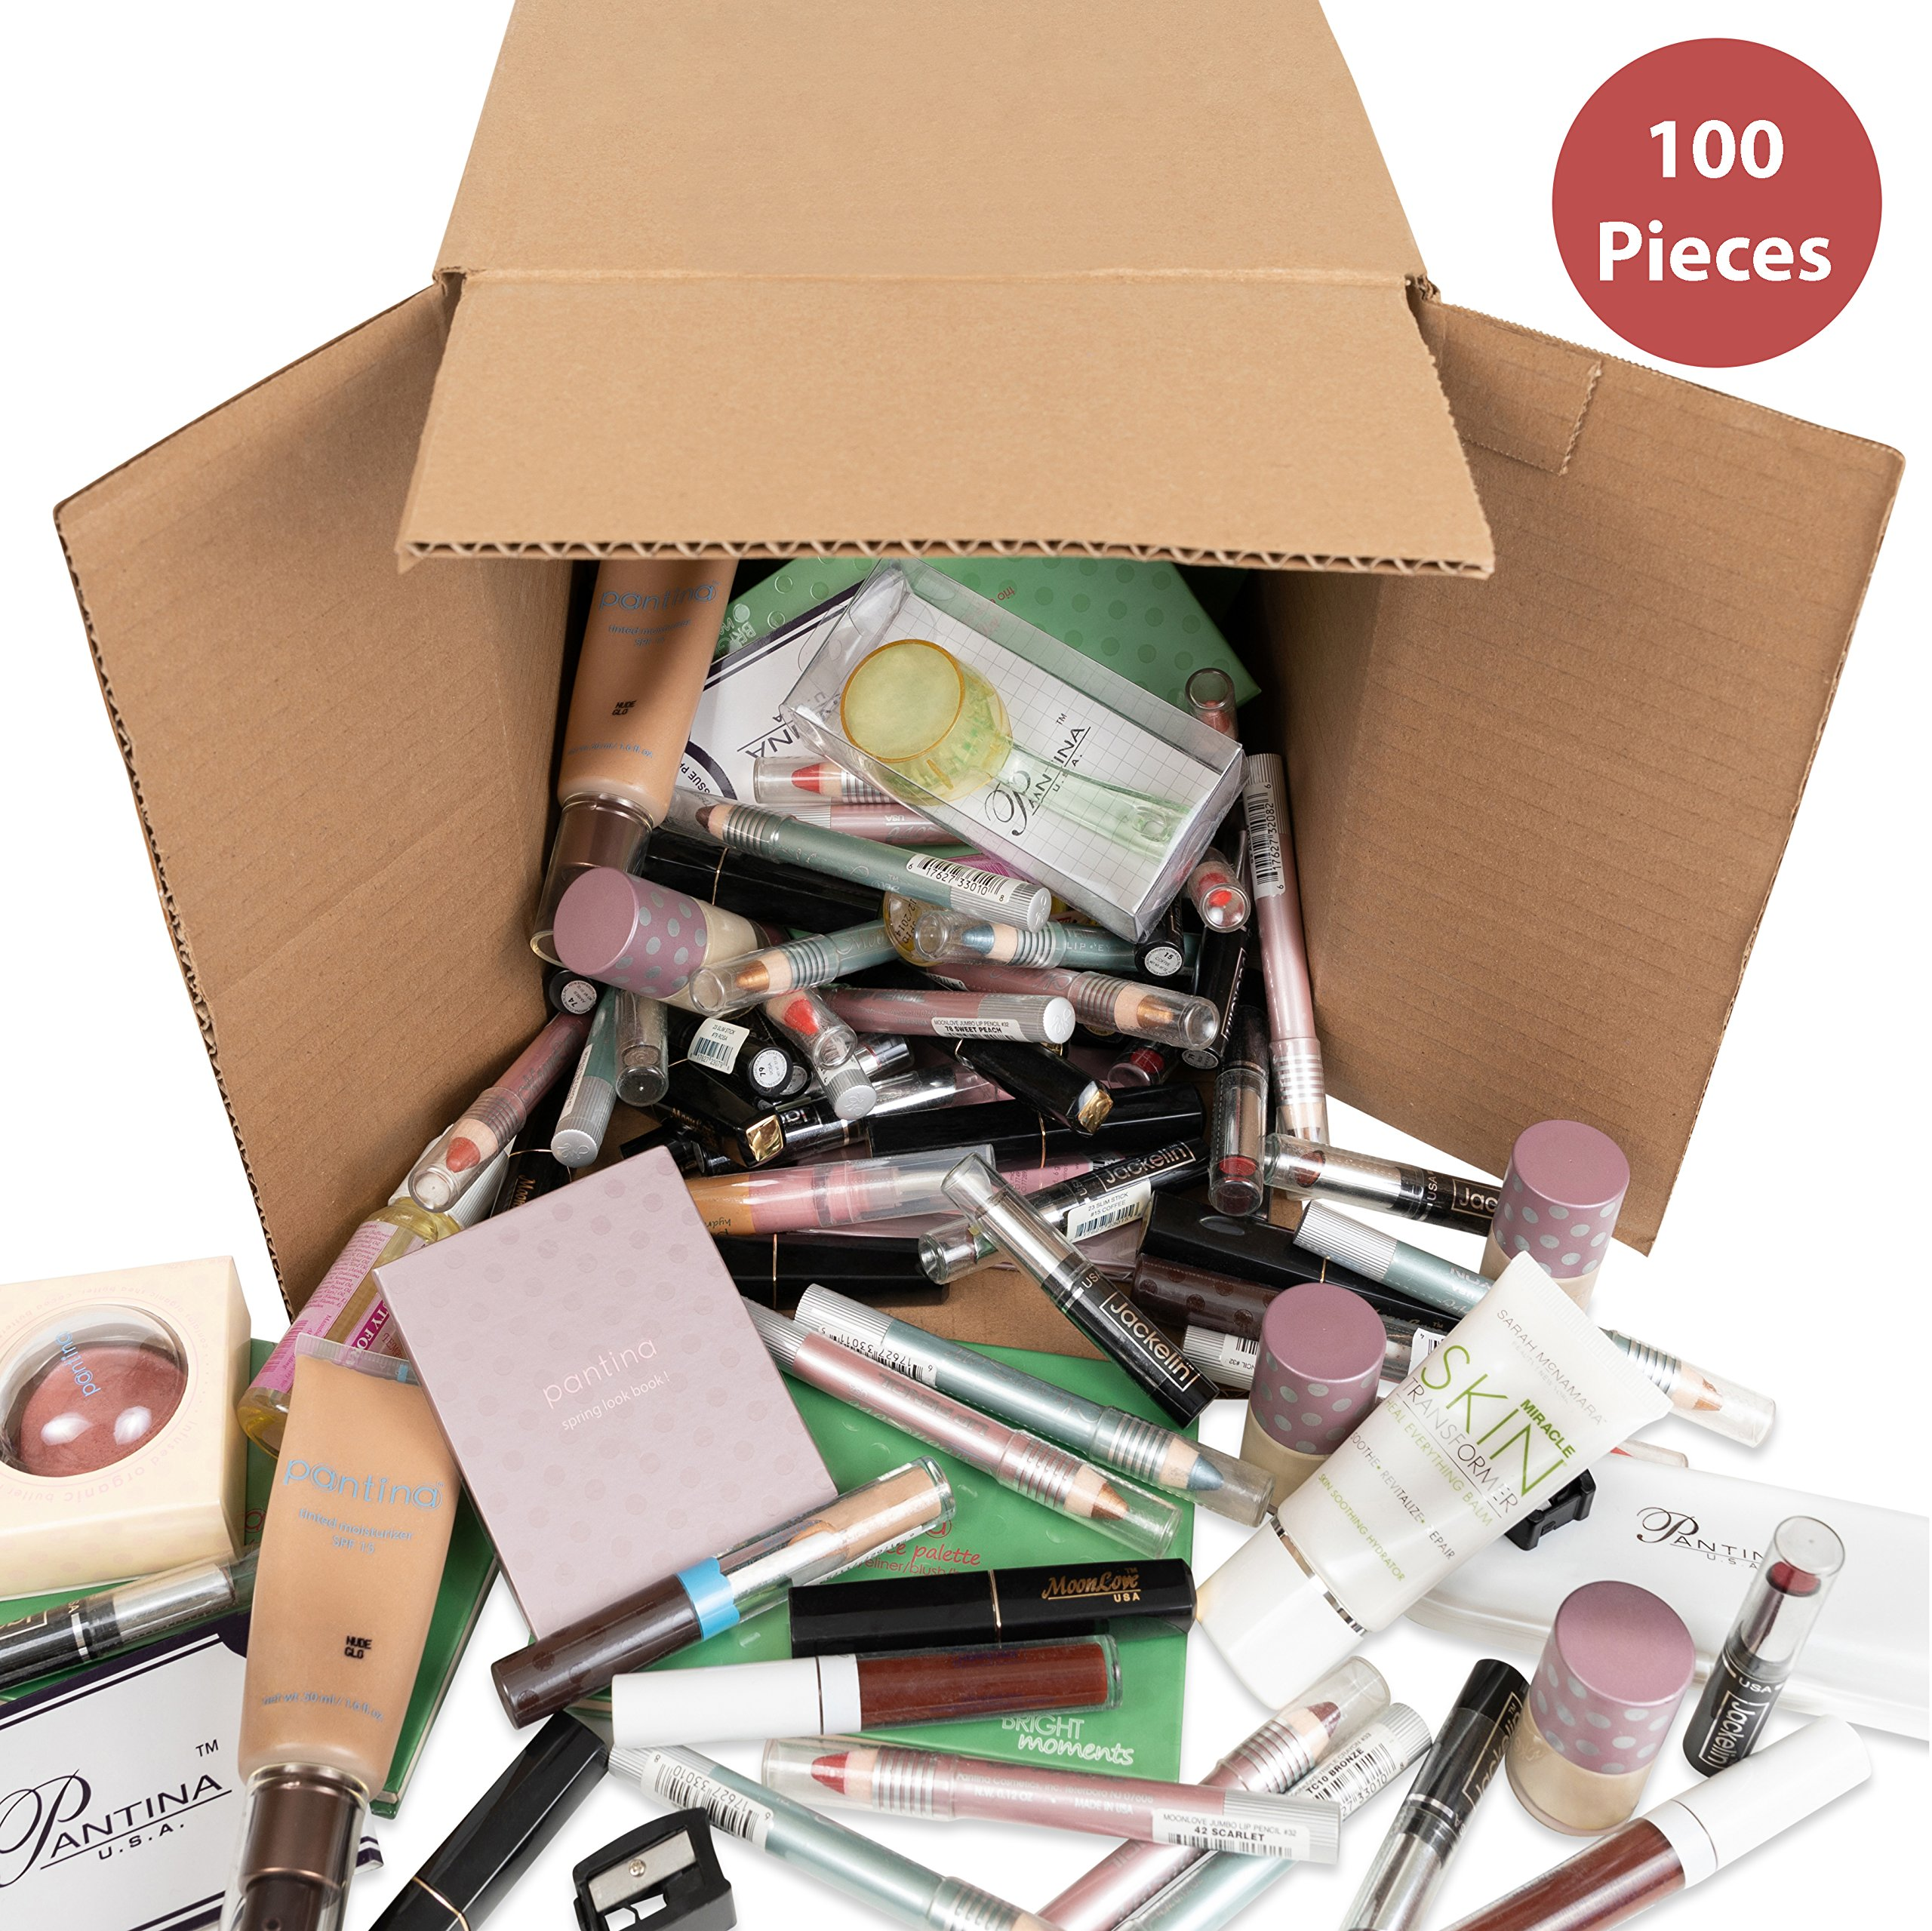 100-Piece Wholesale Bulk Makeup Assorted Cosmetics Box, Kit, Lot, Set, Kids, Girls, Women, Party Favors, Cheap, Gift, Birthday by Truscope